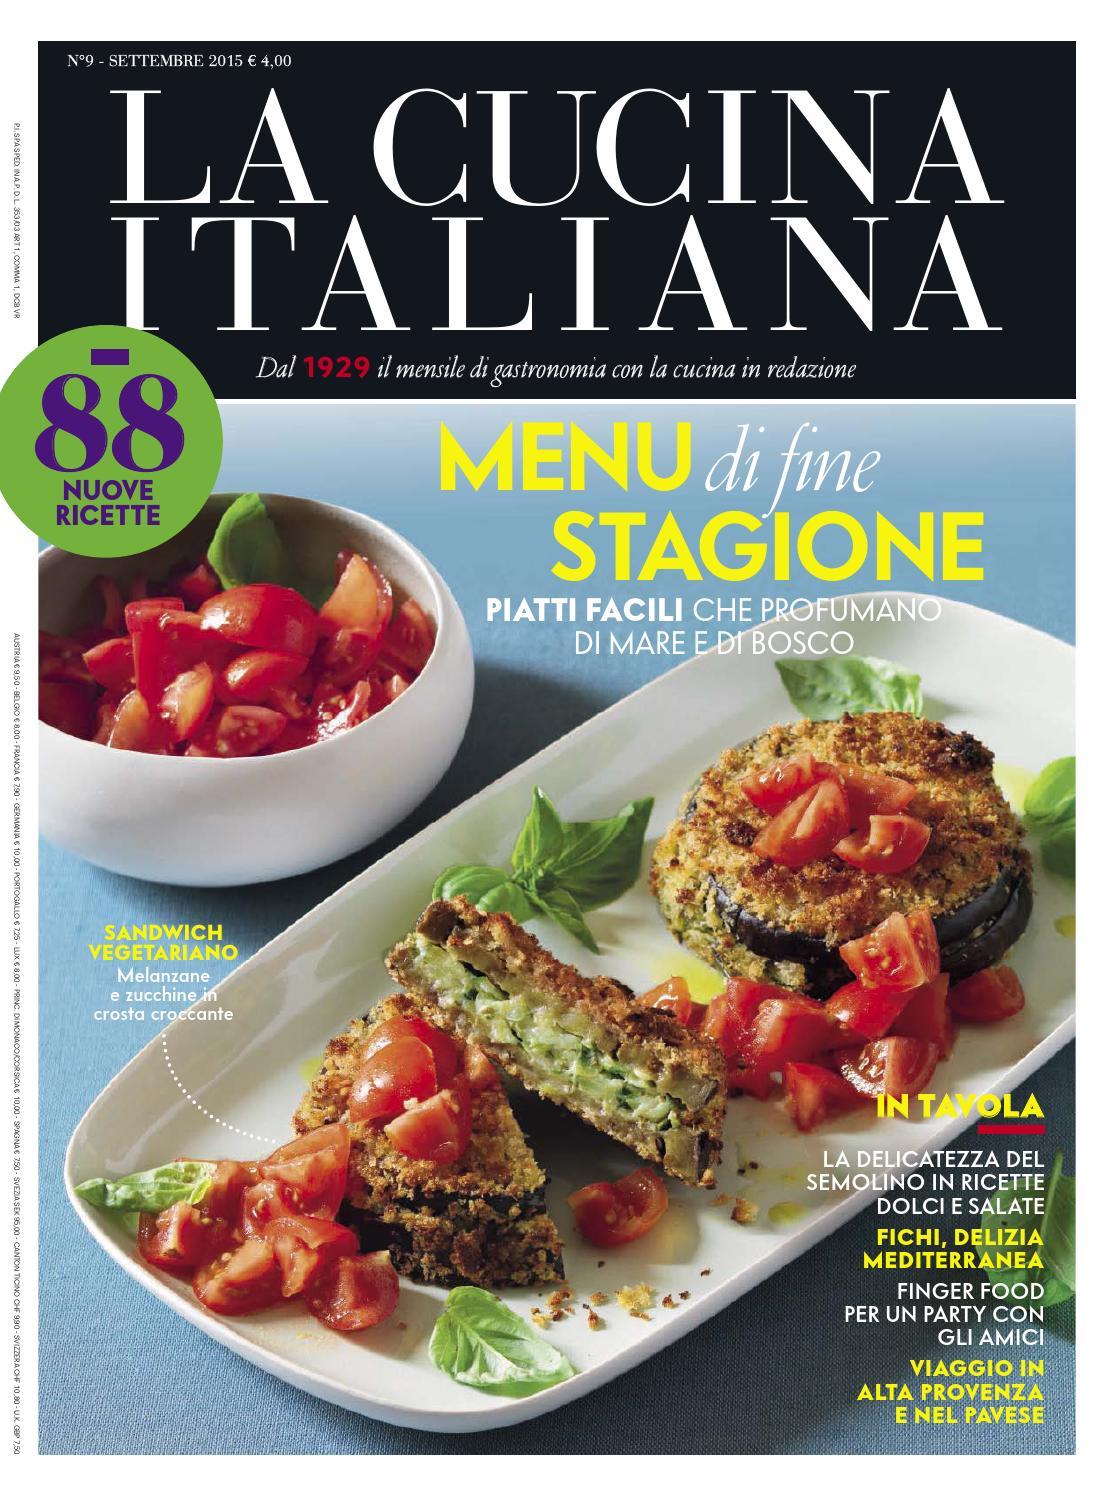 La cucina italiana settembre 2015 by sineminbahari issuu for Ricette alta cucina italiana